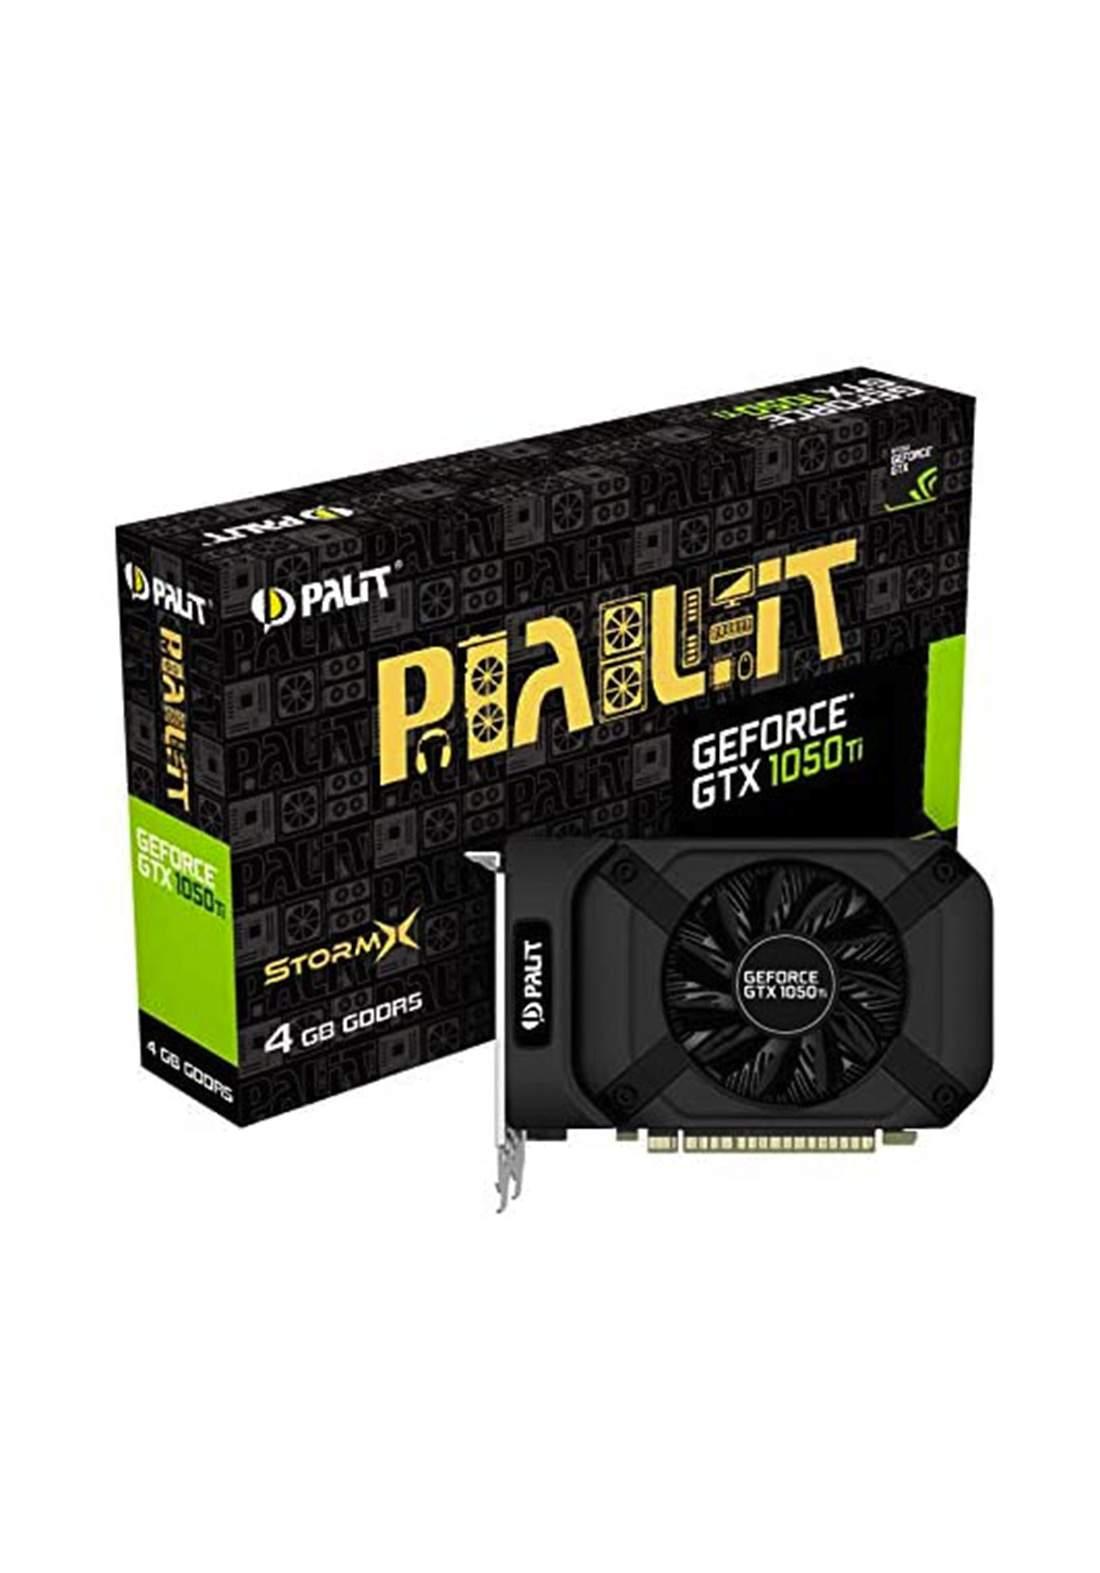 Palit GeForce GTX 1050TI Graphics Card 4GB Graphics Card